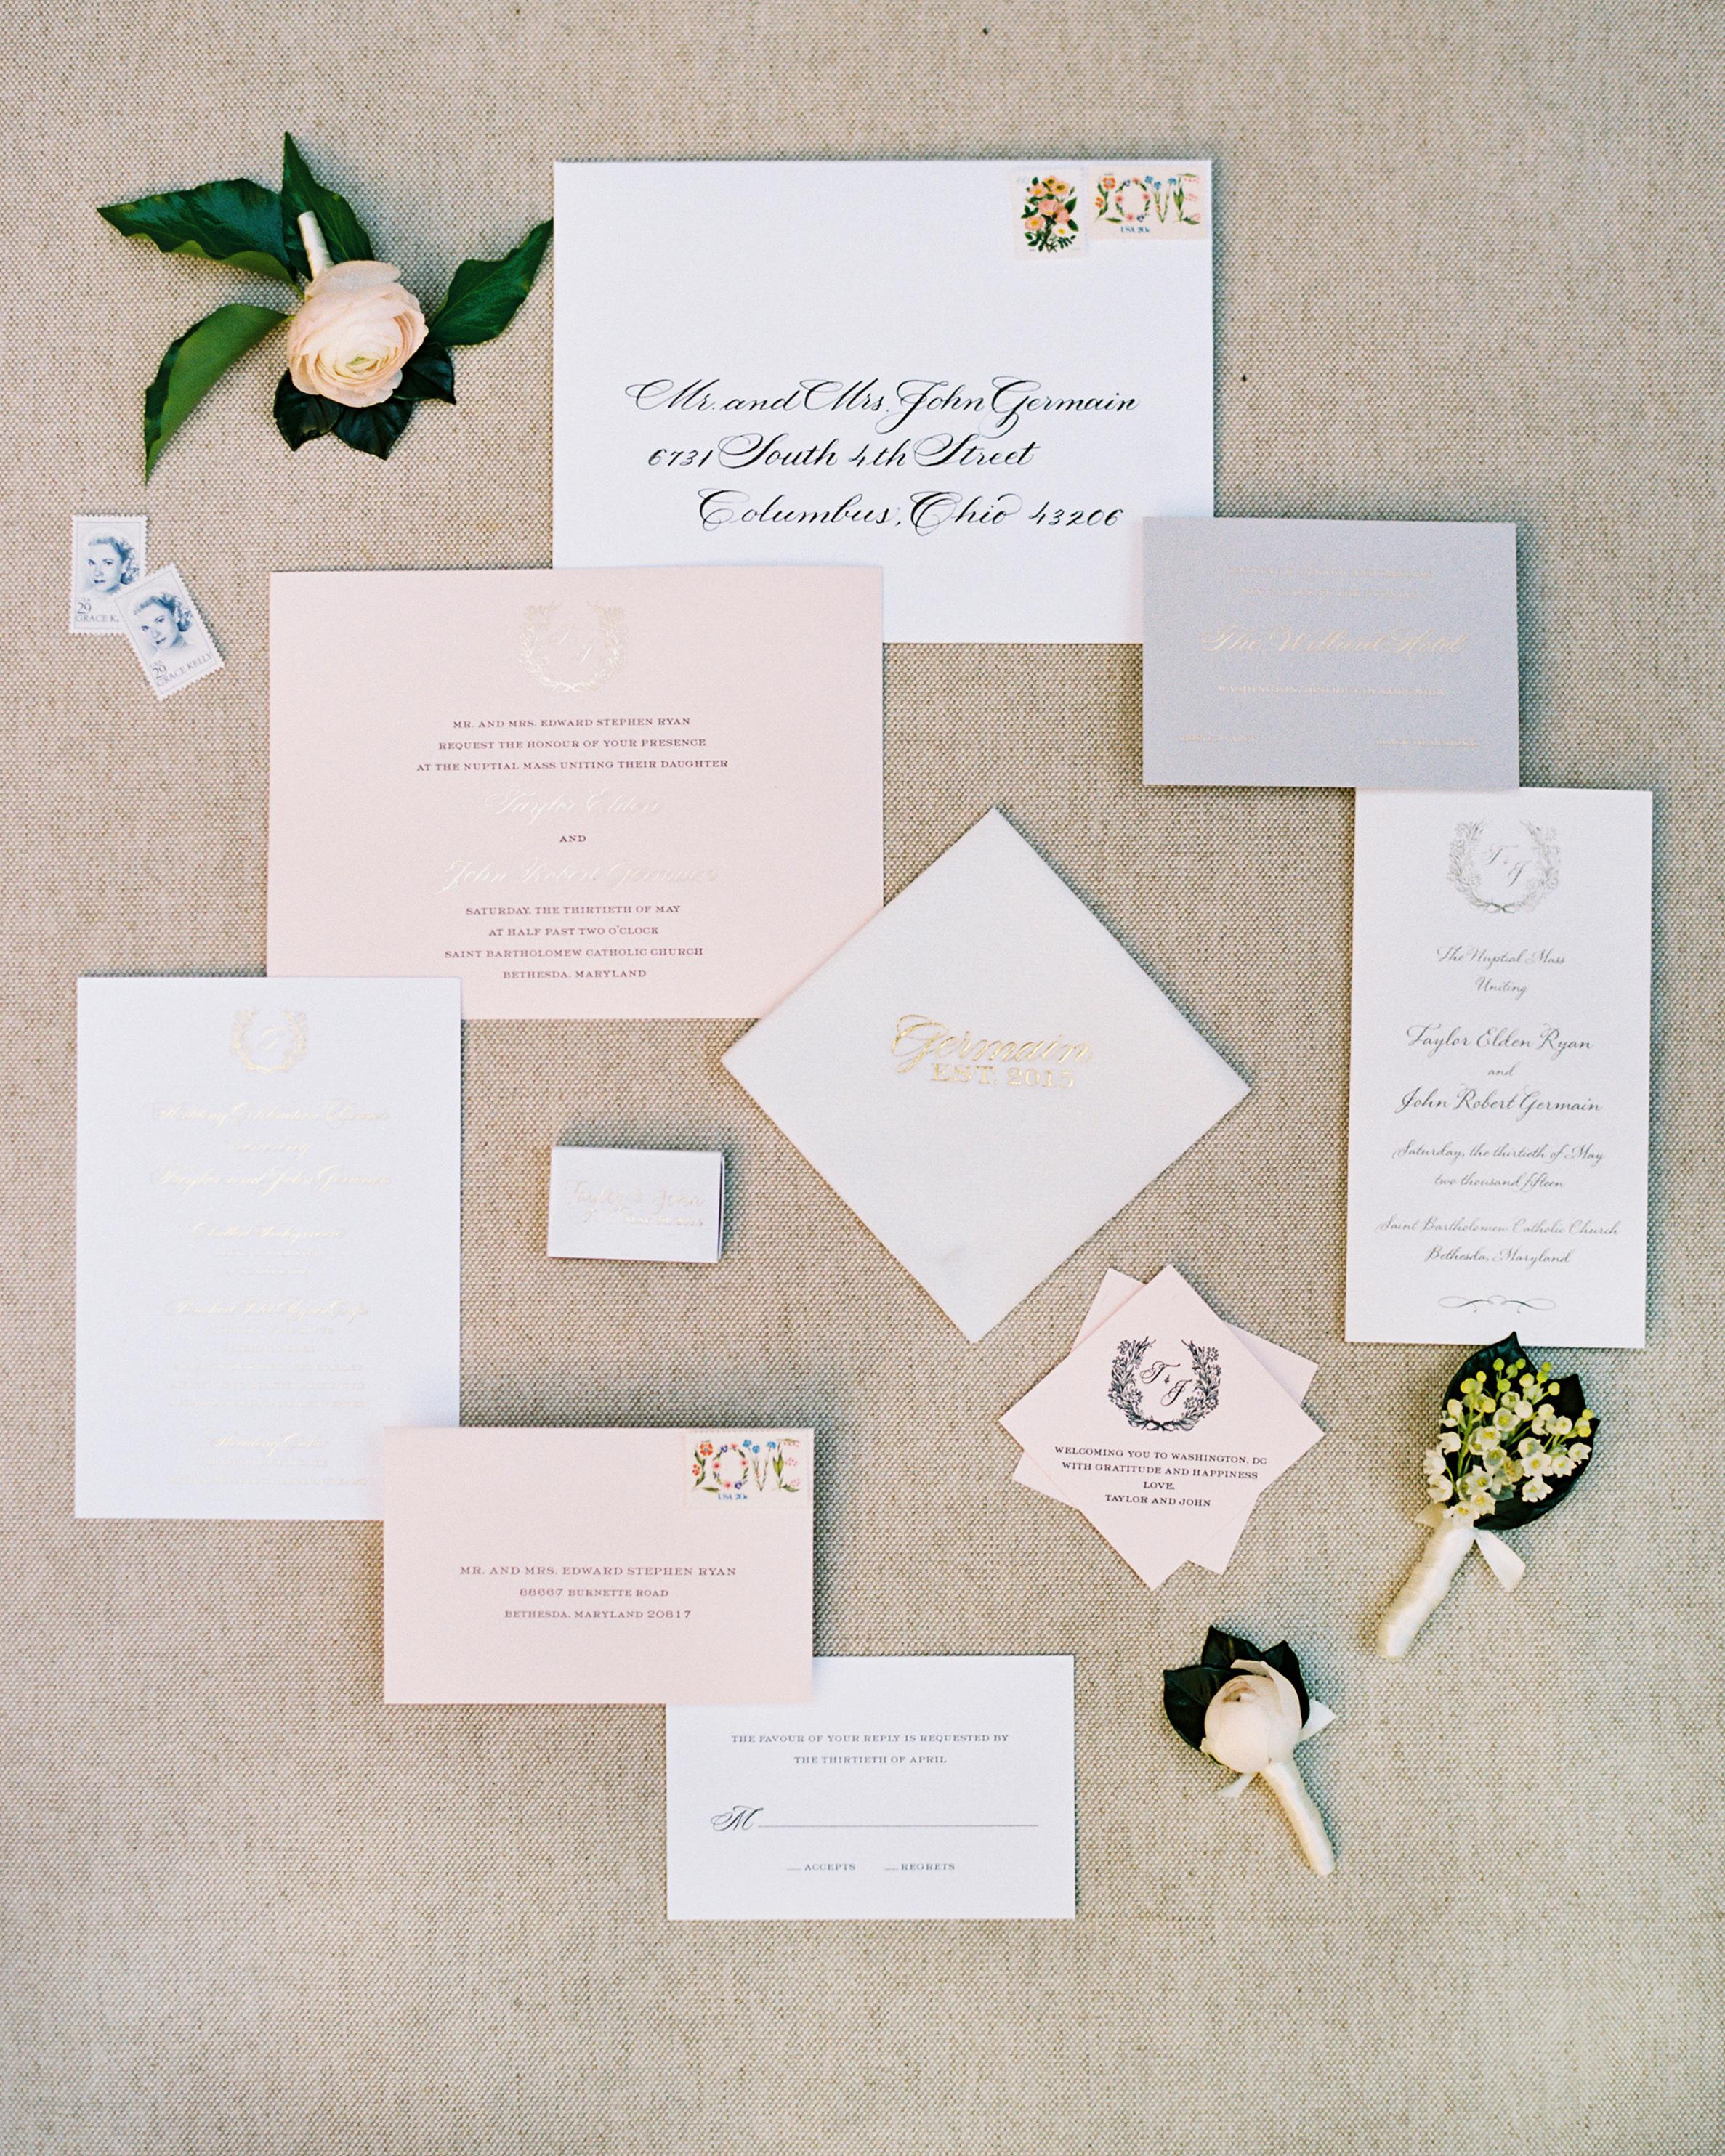 taylor-john-wedding-stationery-441-s112507-0116.jpg